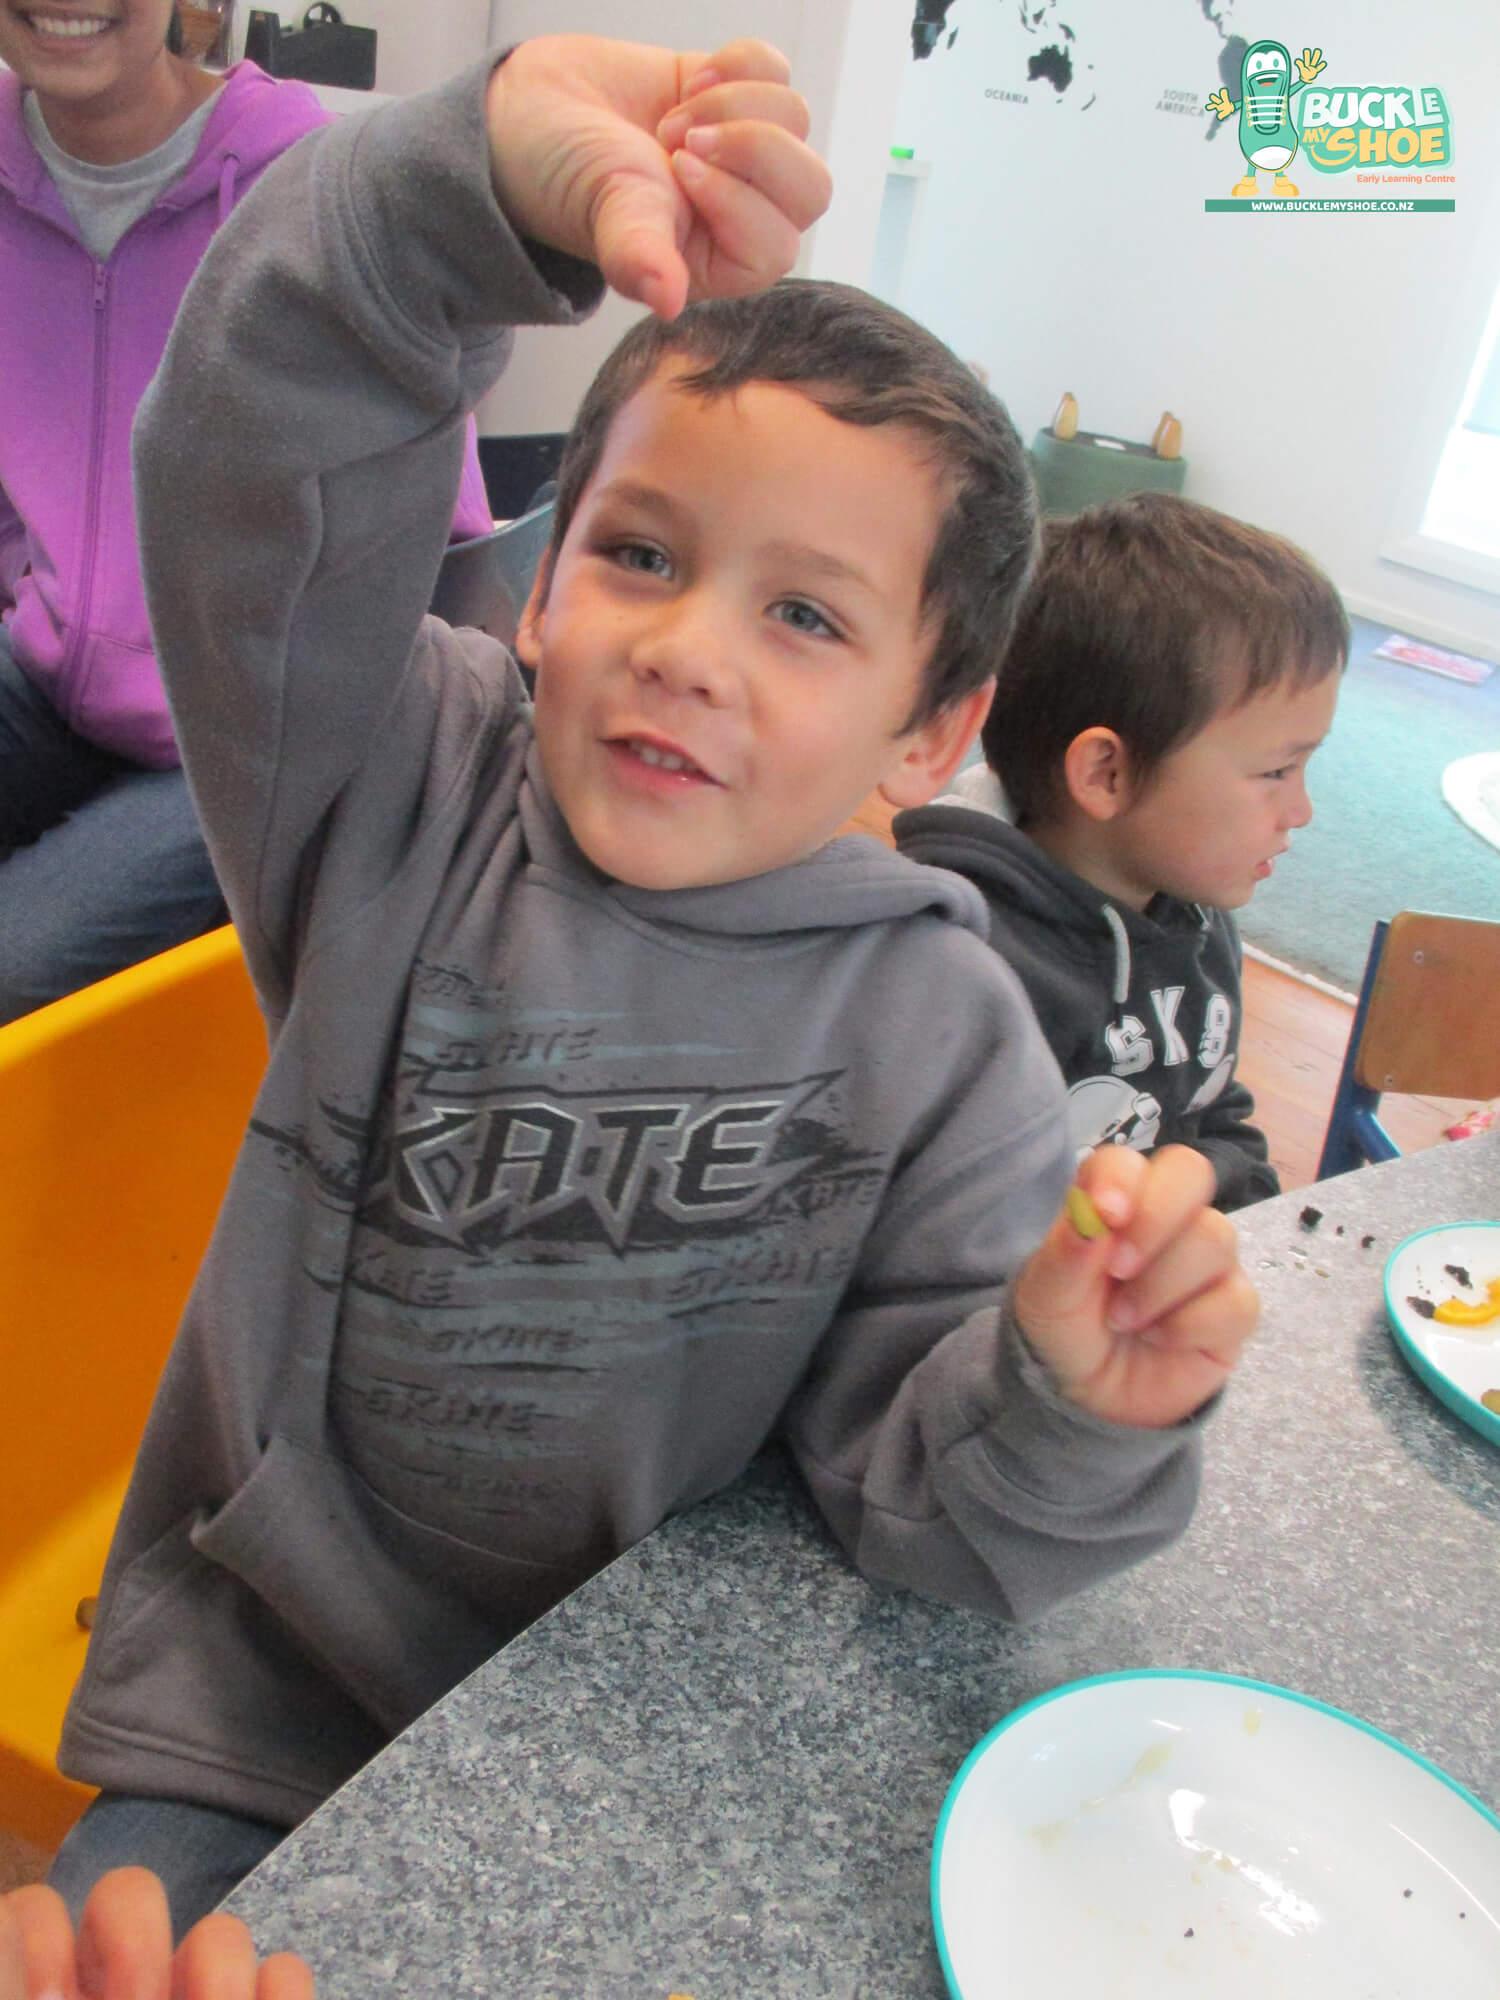 buckle-my-shoe-childcare-tauranga-butterfly-pt2-7.jpg